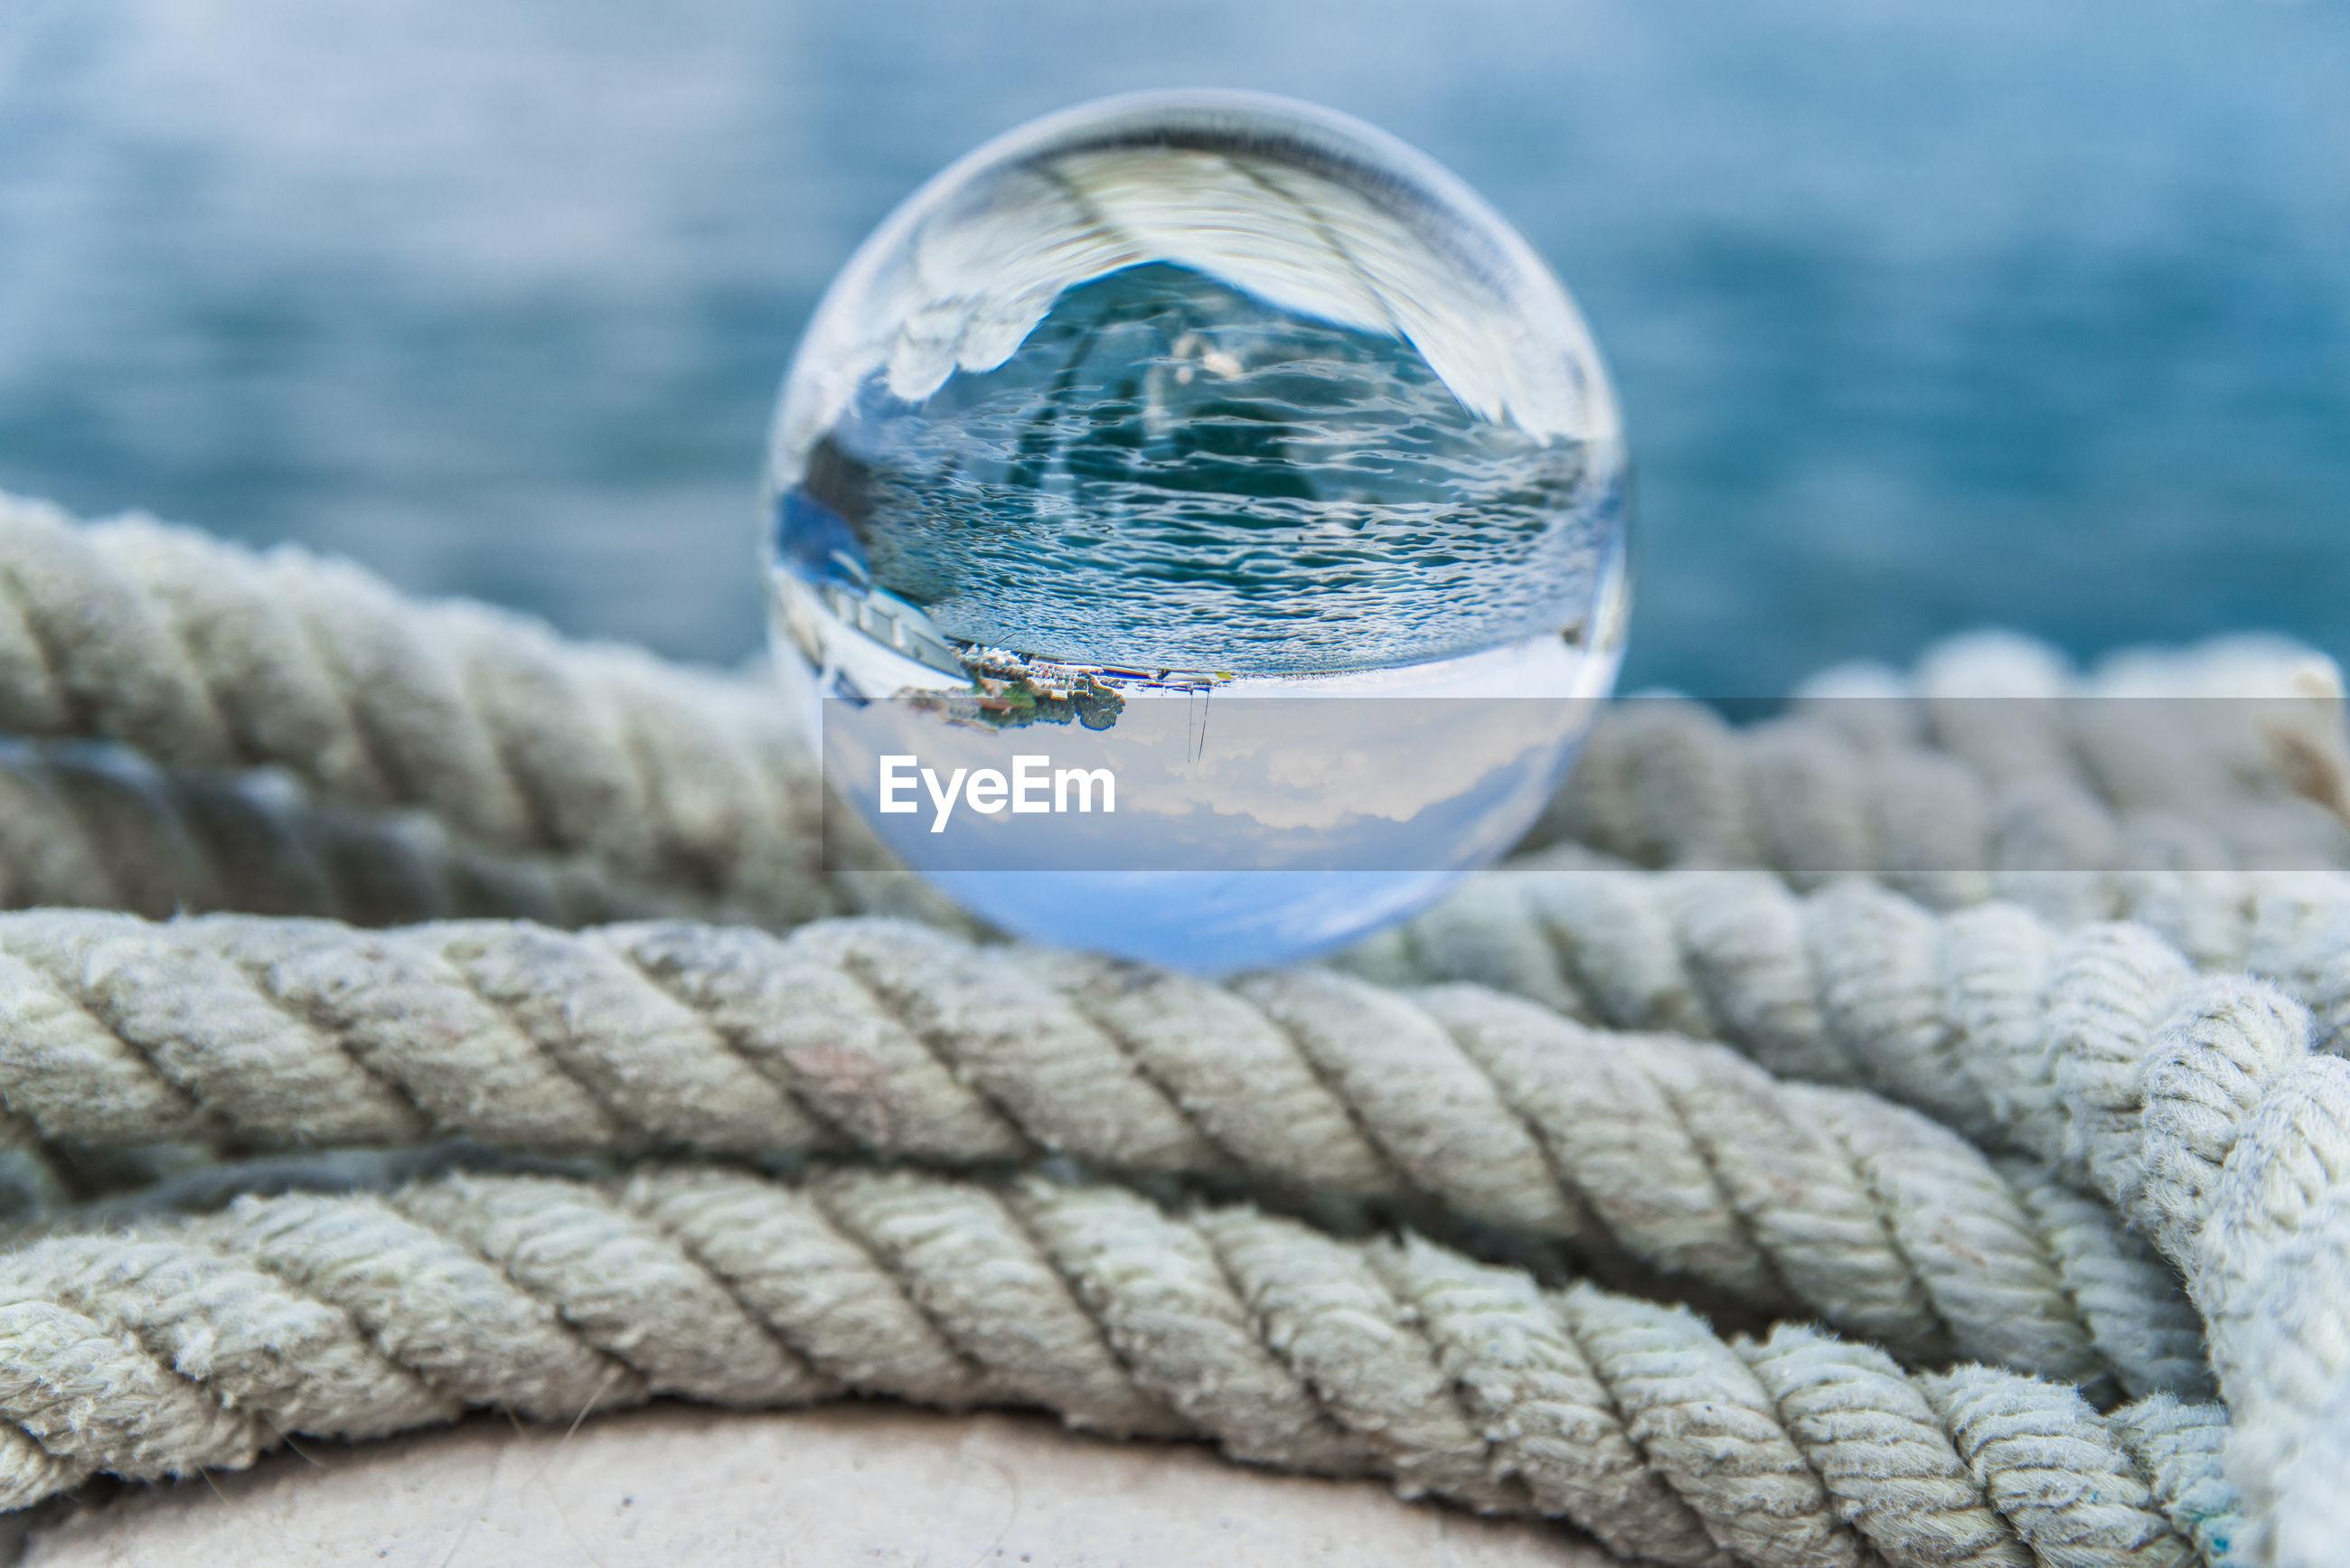 Close-up of crystal ball on rope at harbor